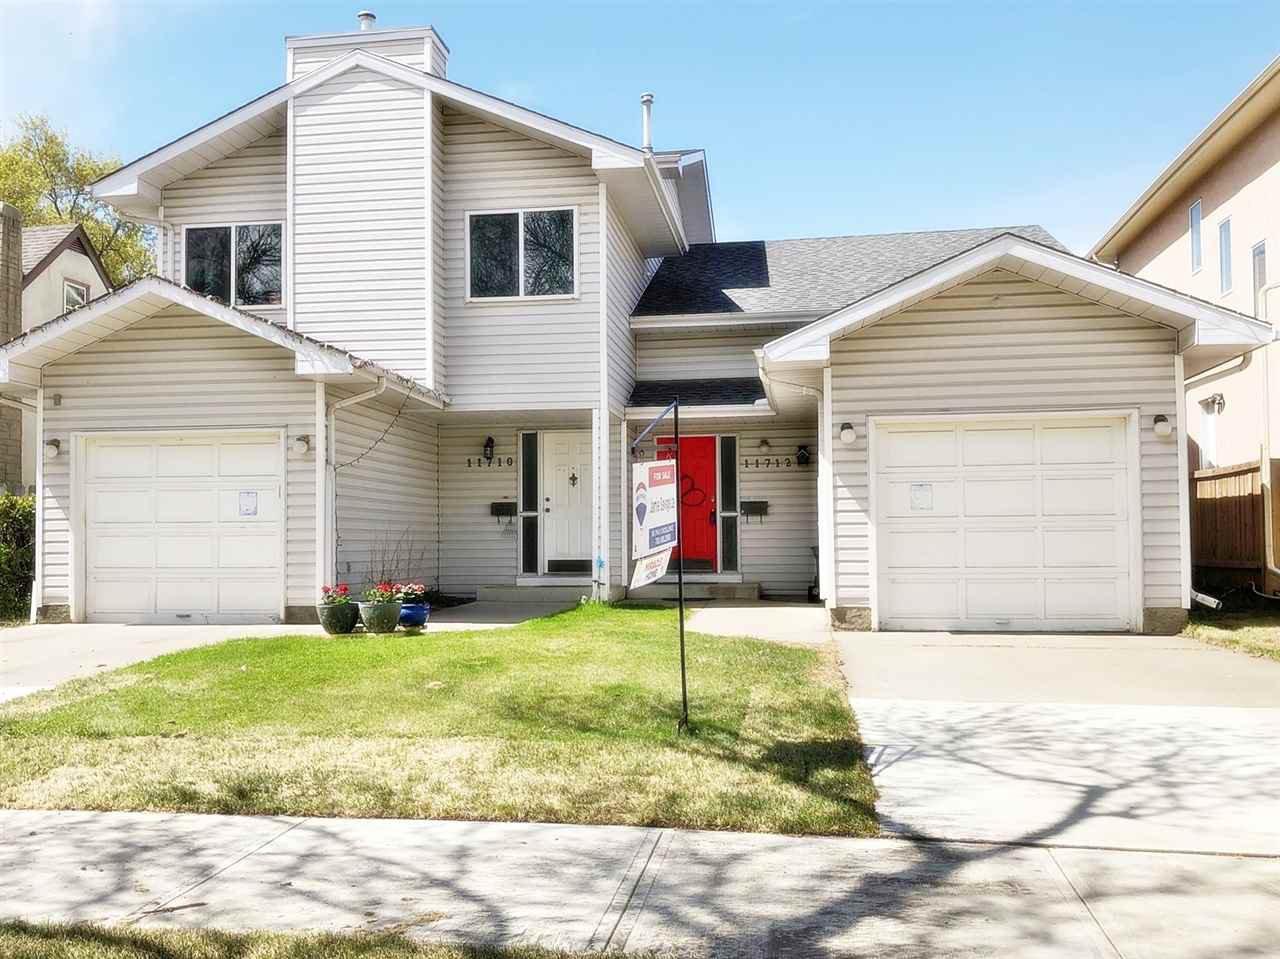 Main Photo: 11712 123 Street in Edmonton: Zone 07 House Half Duplex for sale : MLS®# E4197616